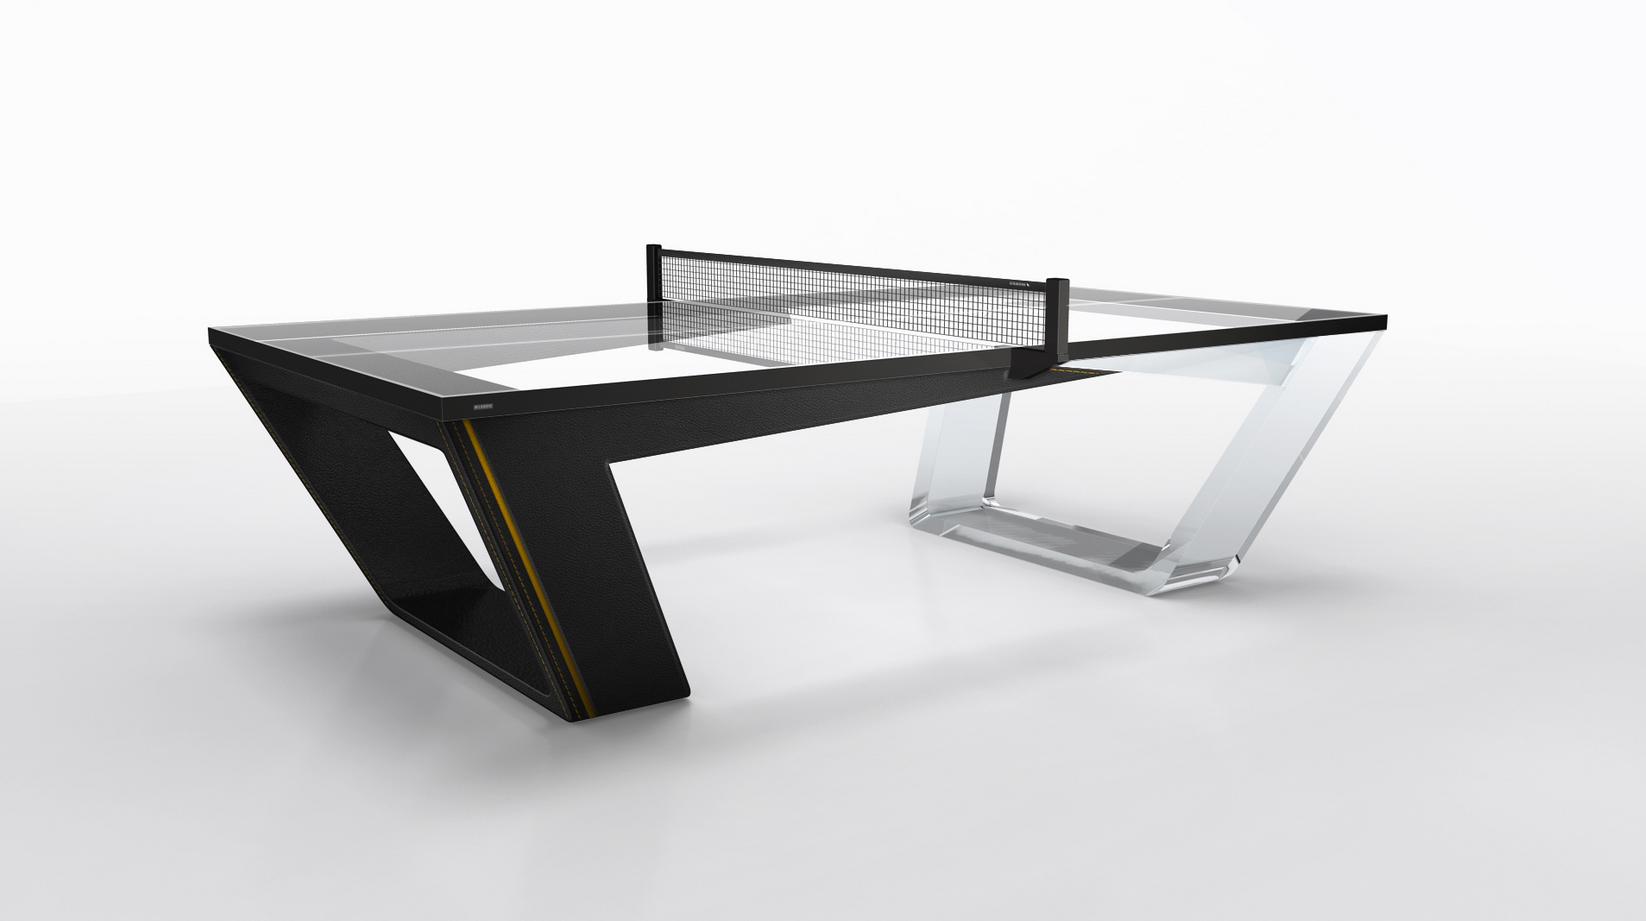 najdrahsi-pingpongovy-stol-02